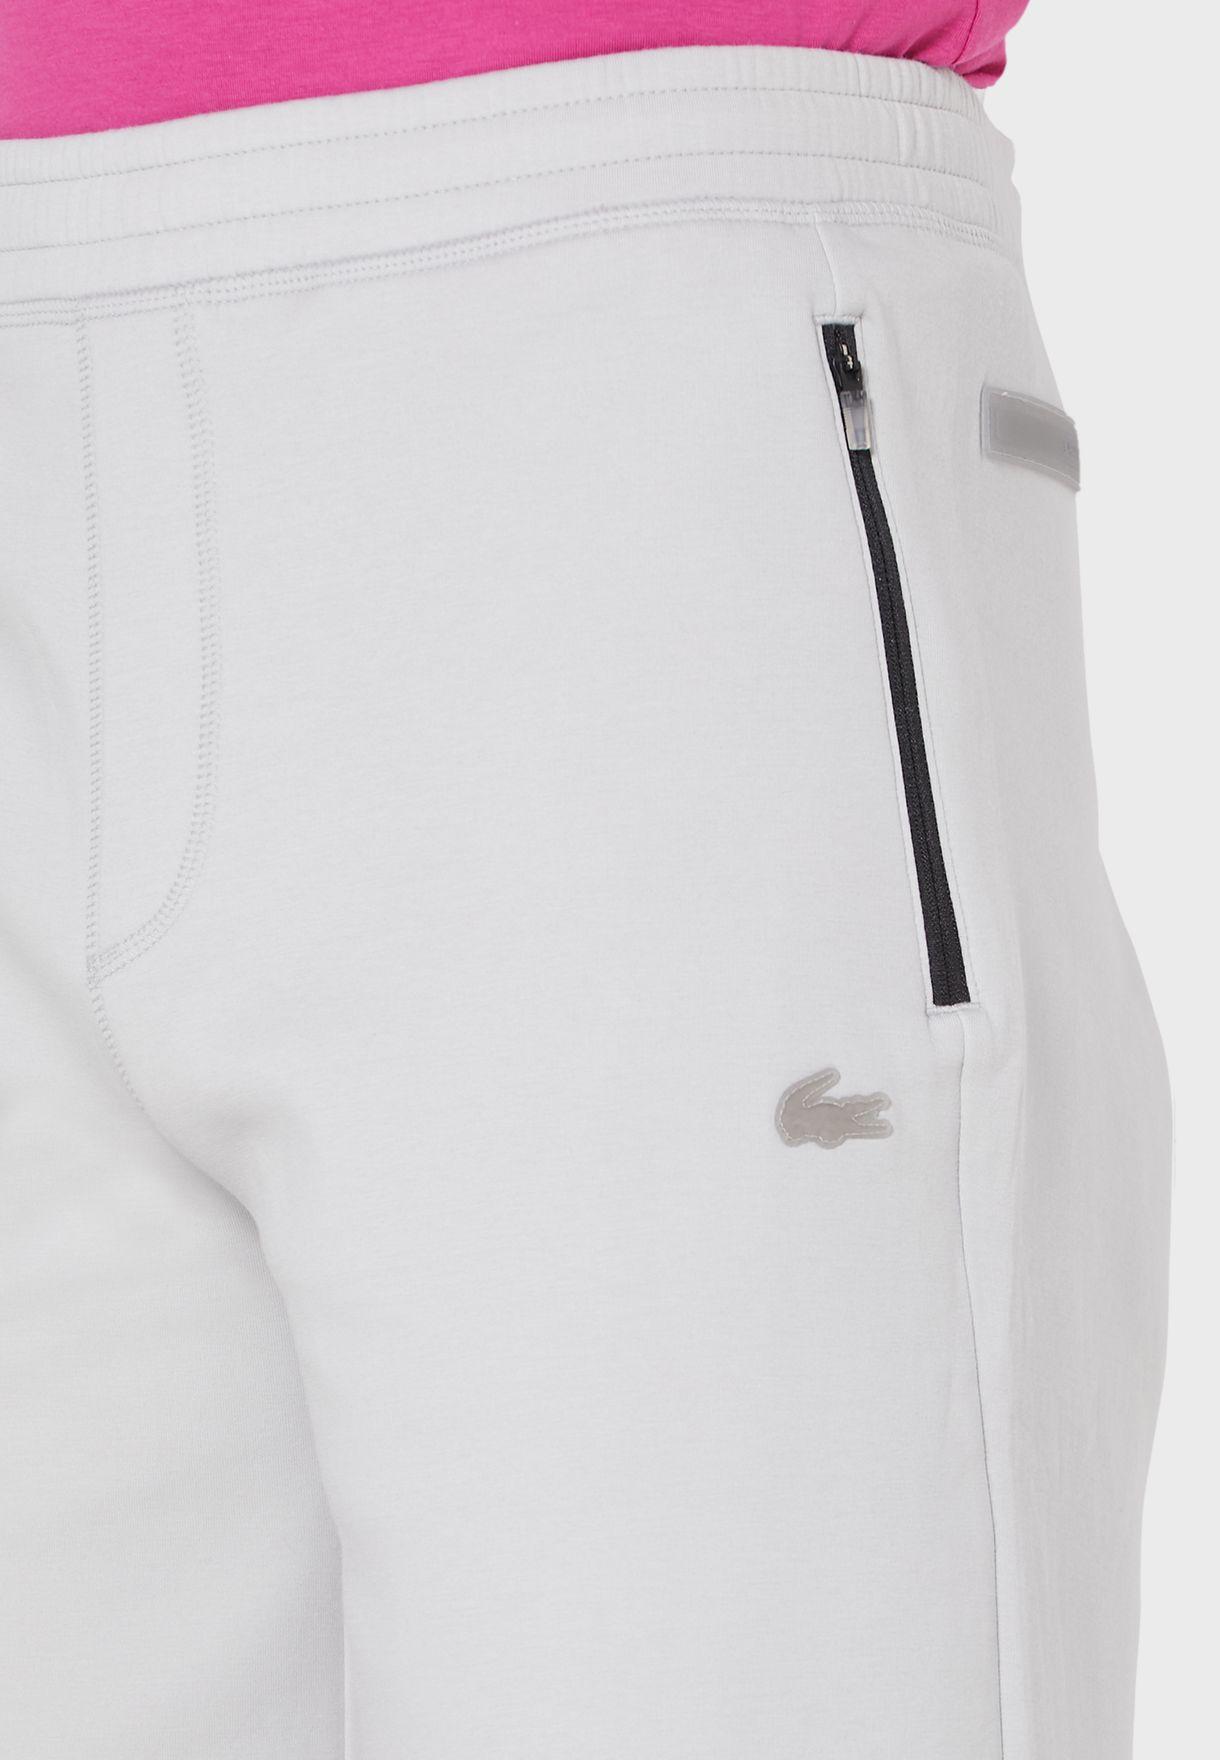 Logo Bermuda Shorts